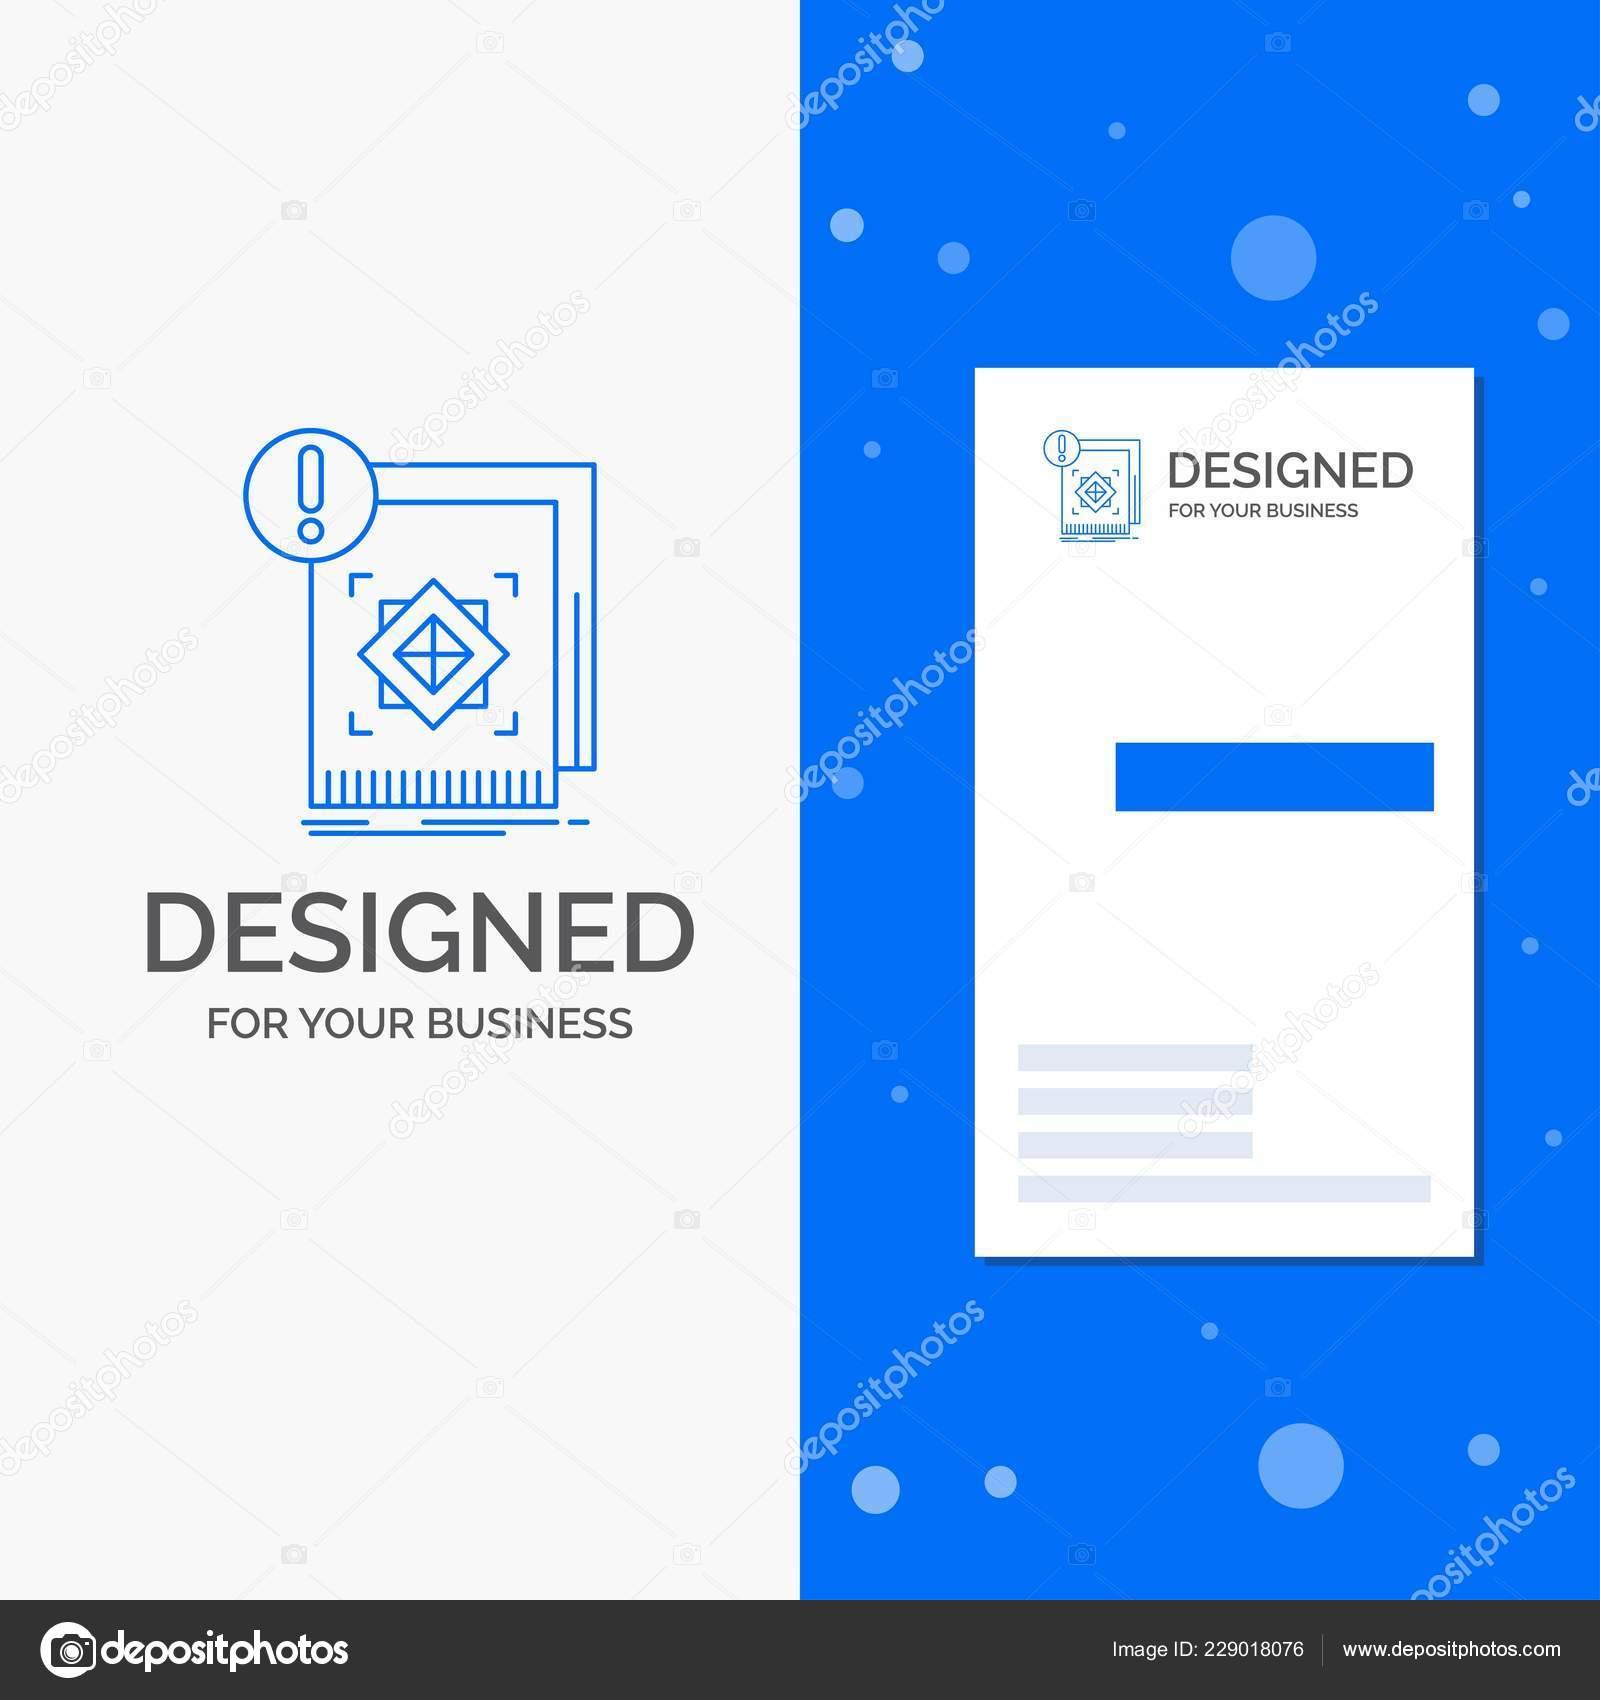 Logo Dentreprise Pour La Structure Norme Infrastructures Information Alerte Vertical Bleu Business Modele De Carte Visite Illustration Stock